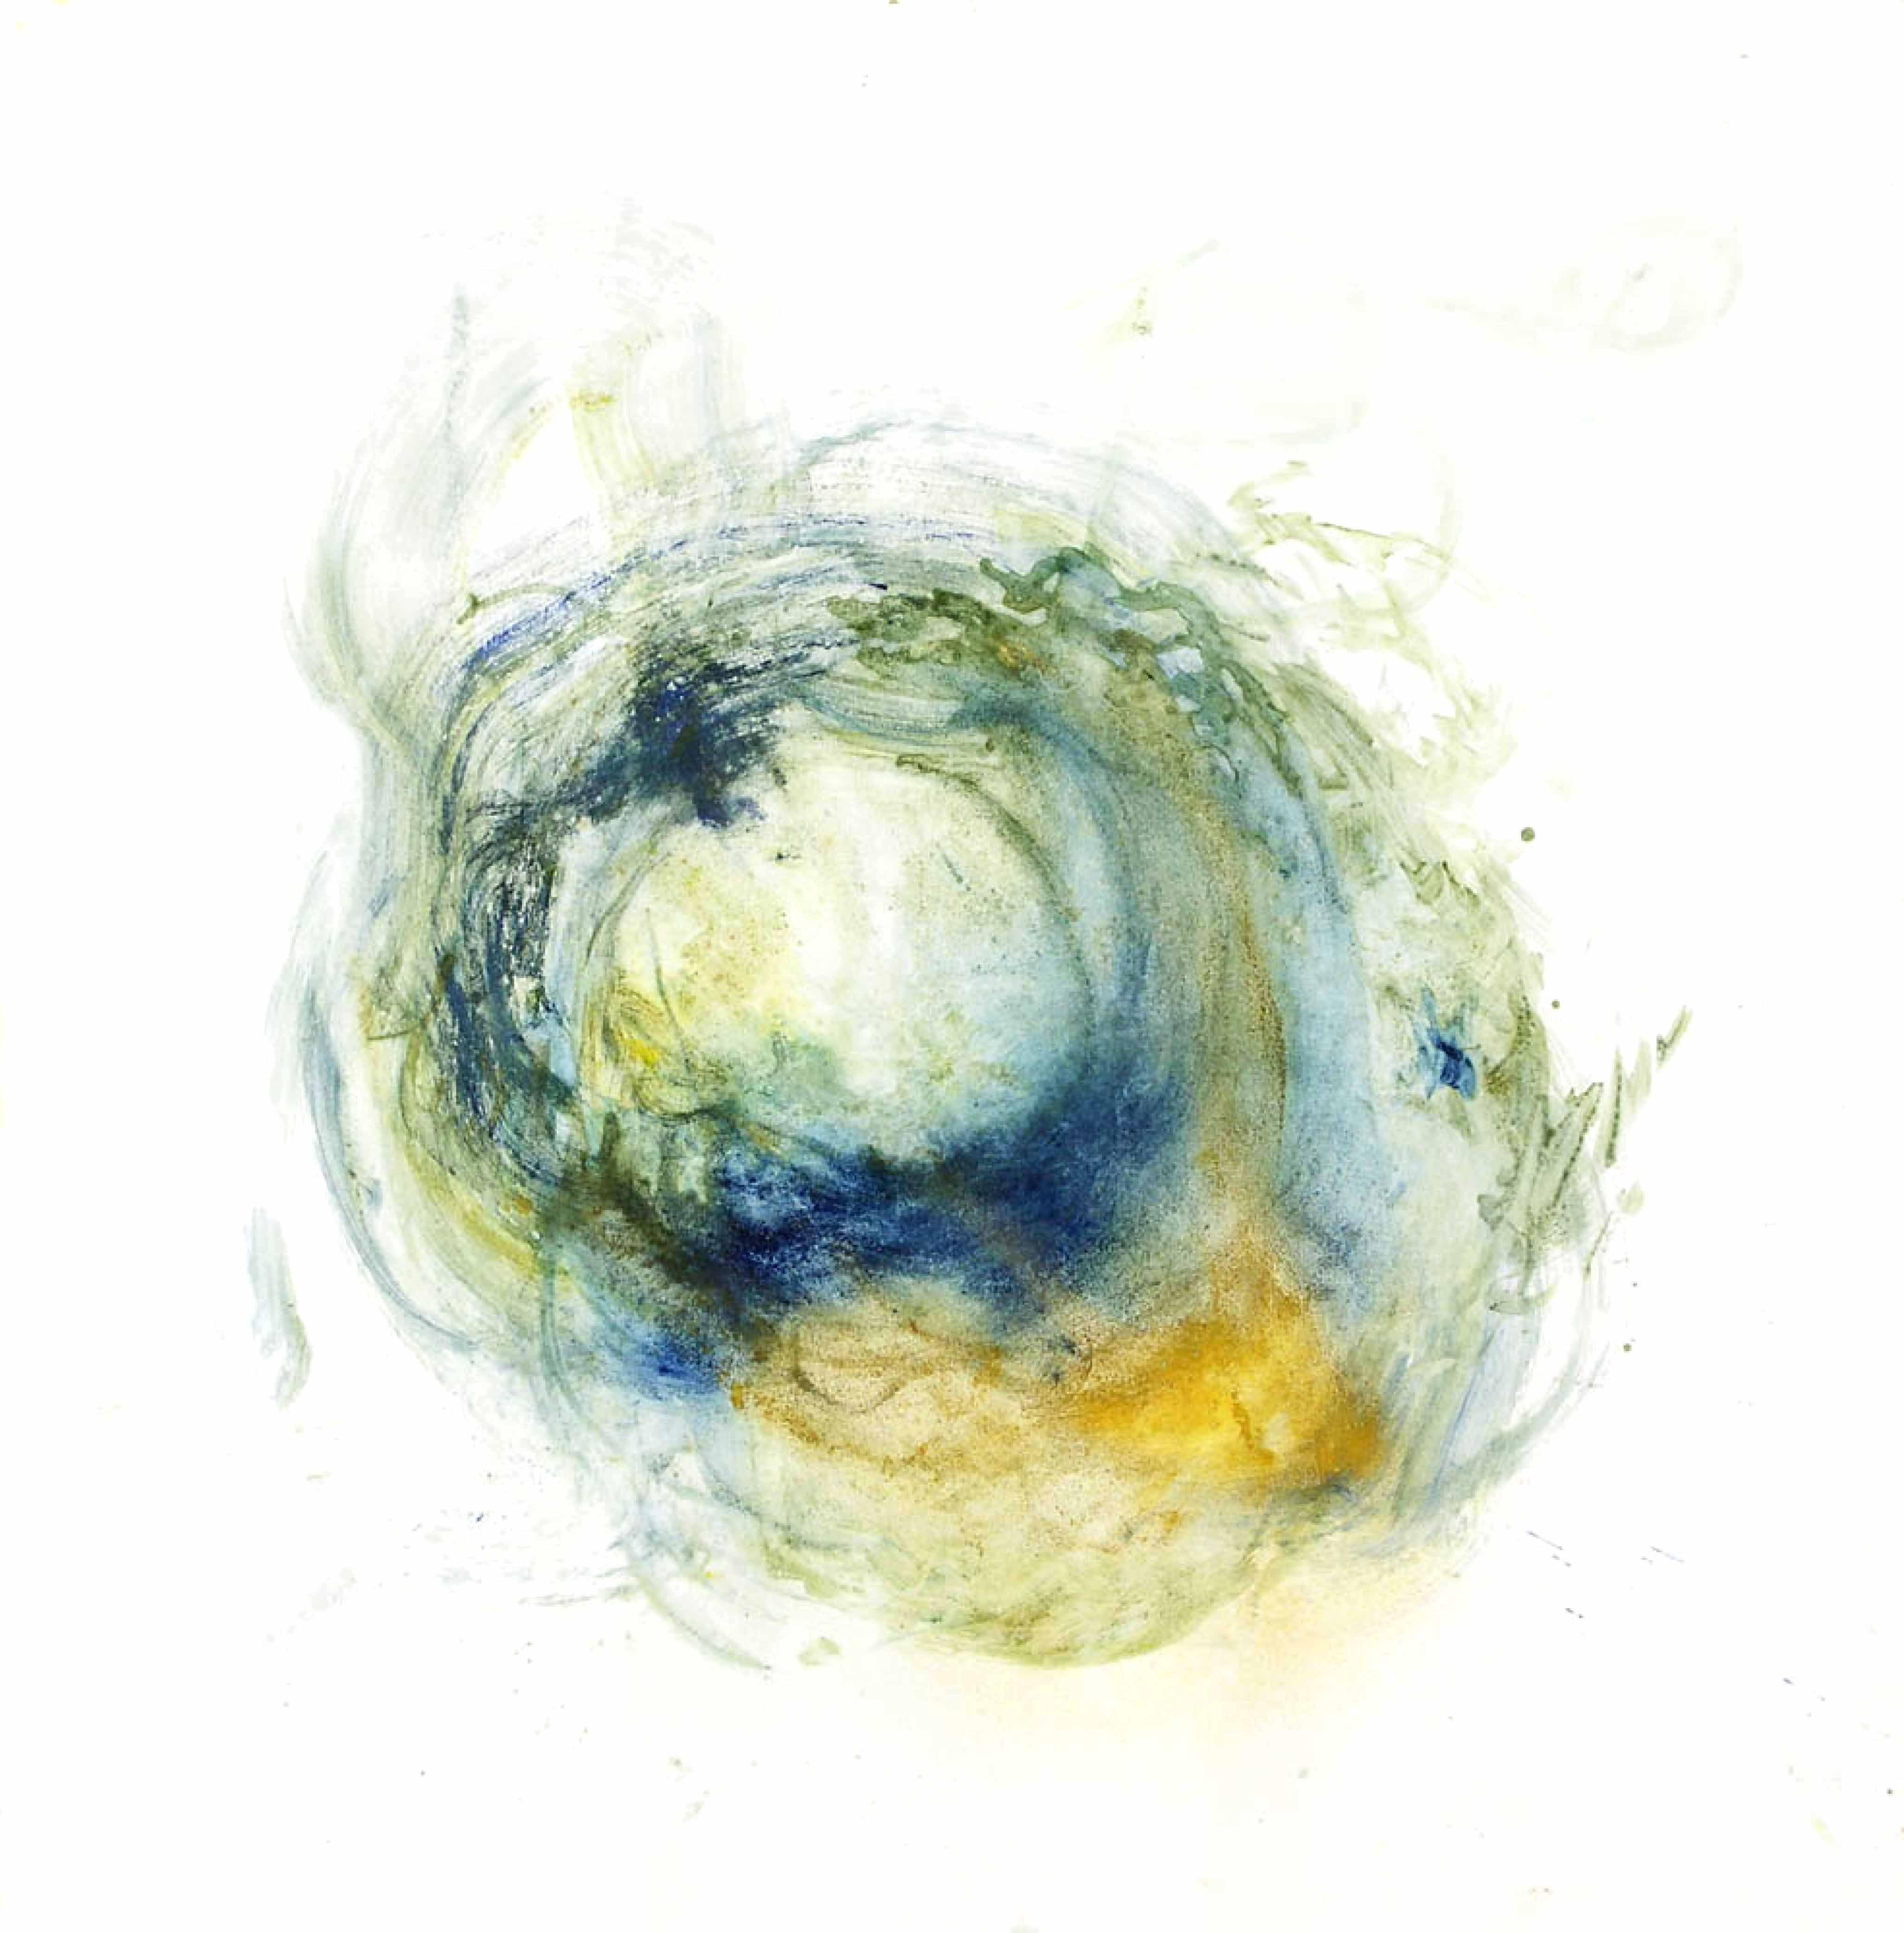 Celule II (2018) - Macarena Robledo